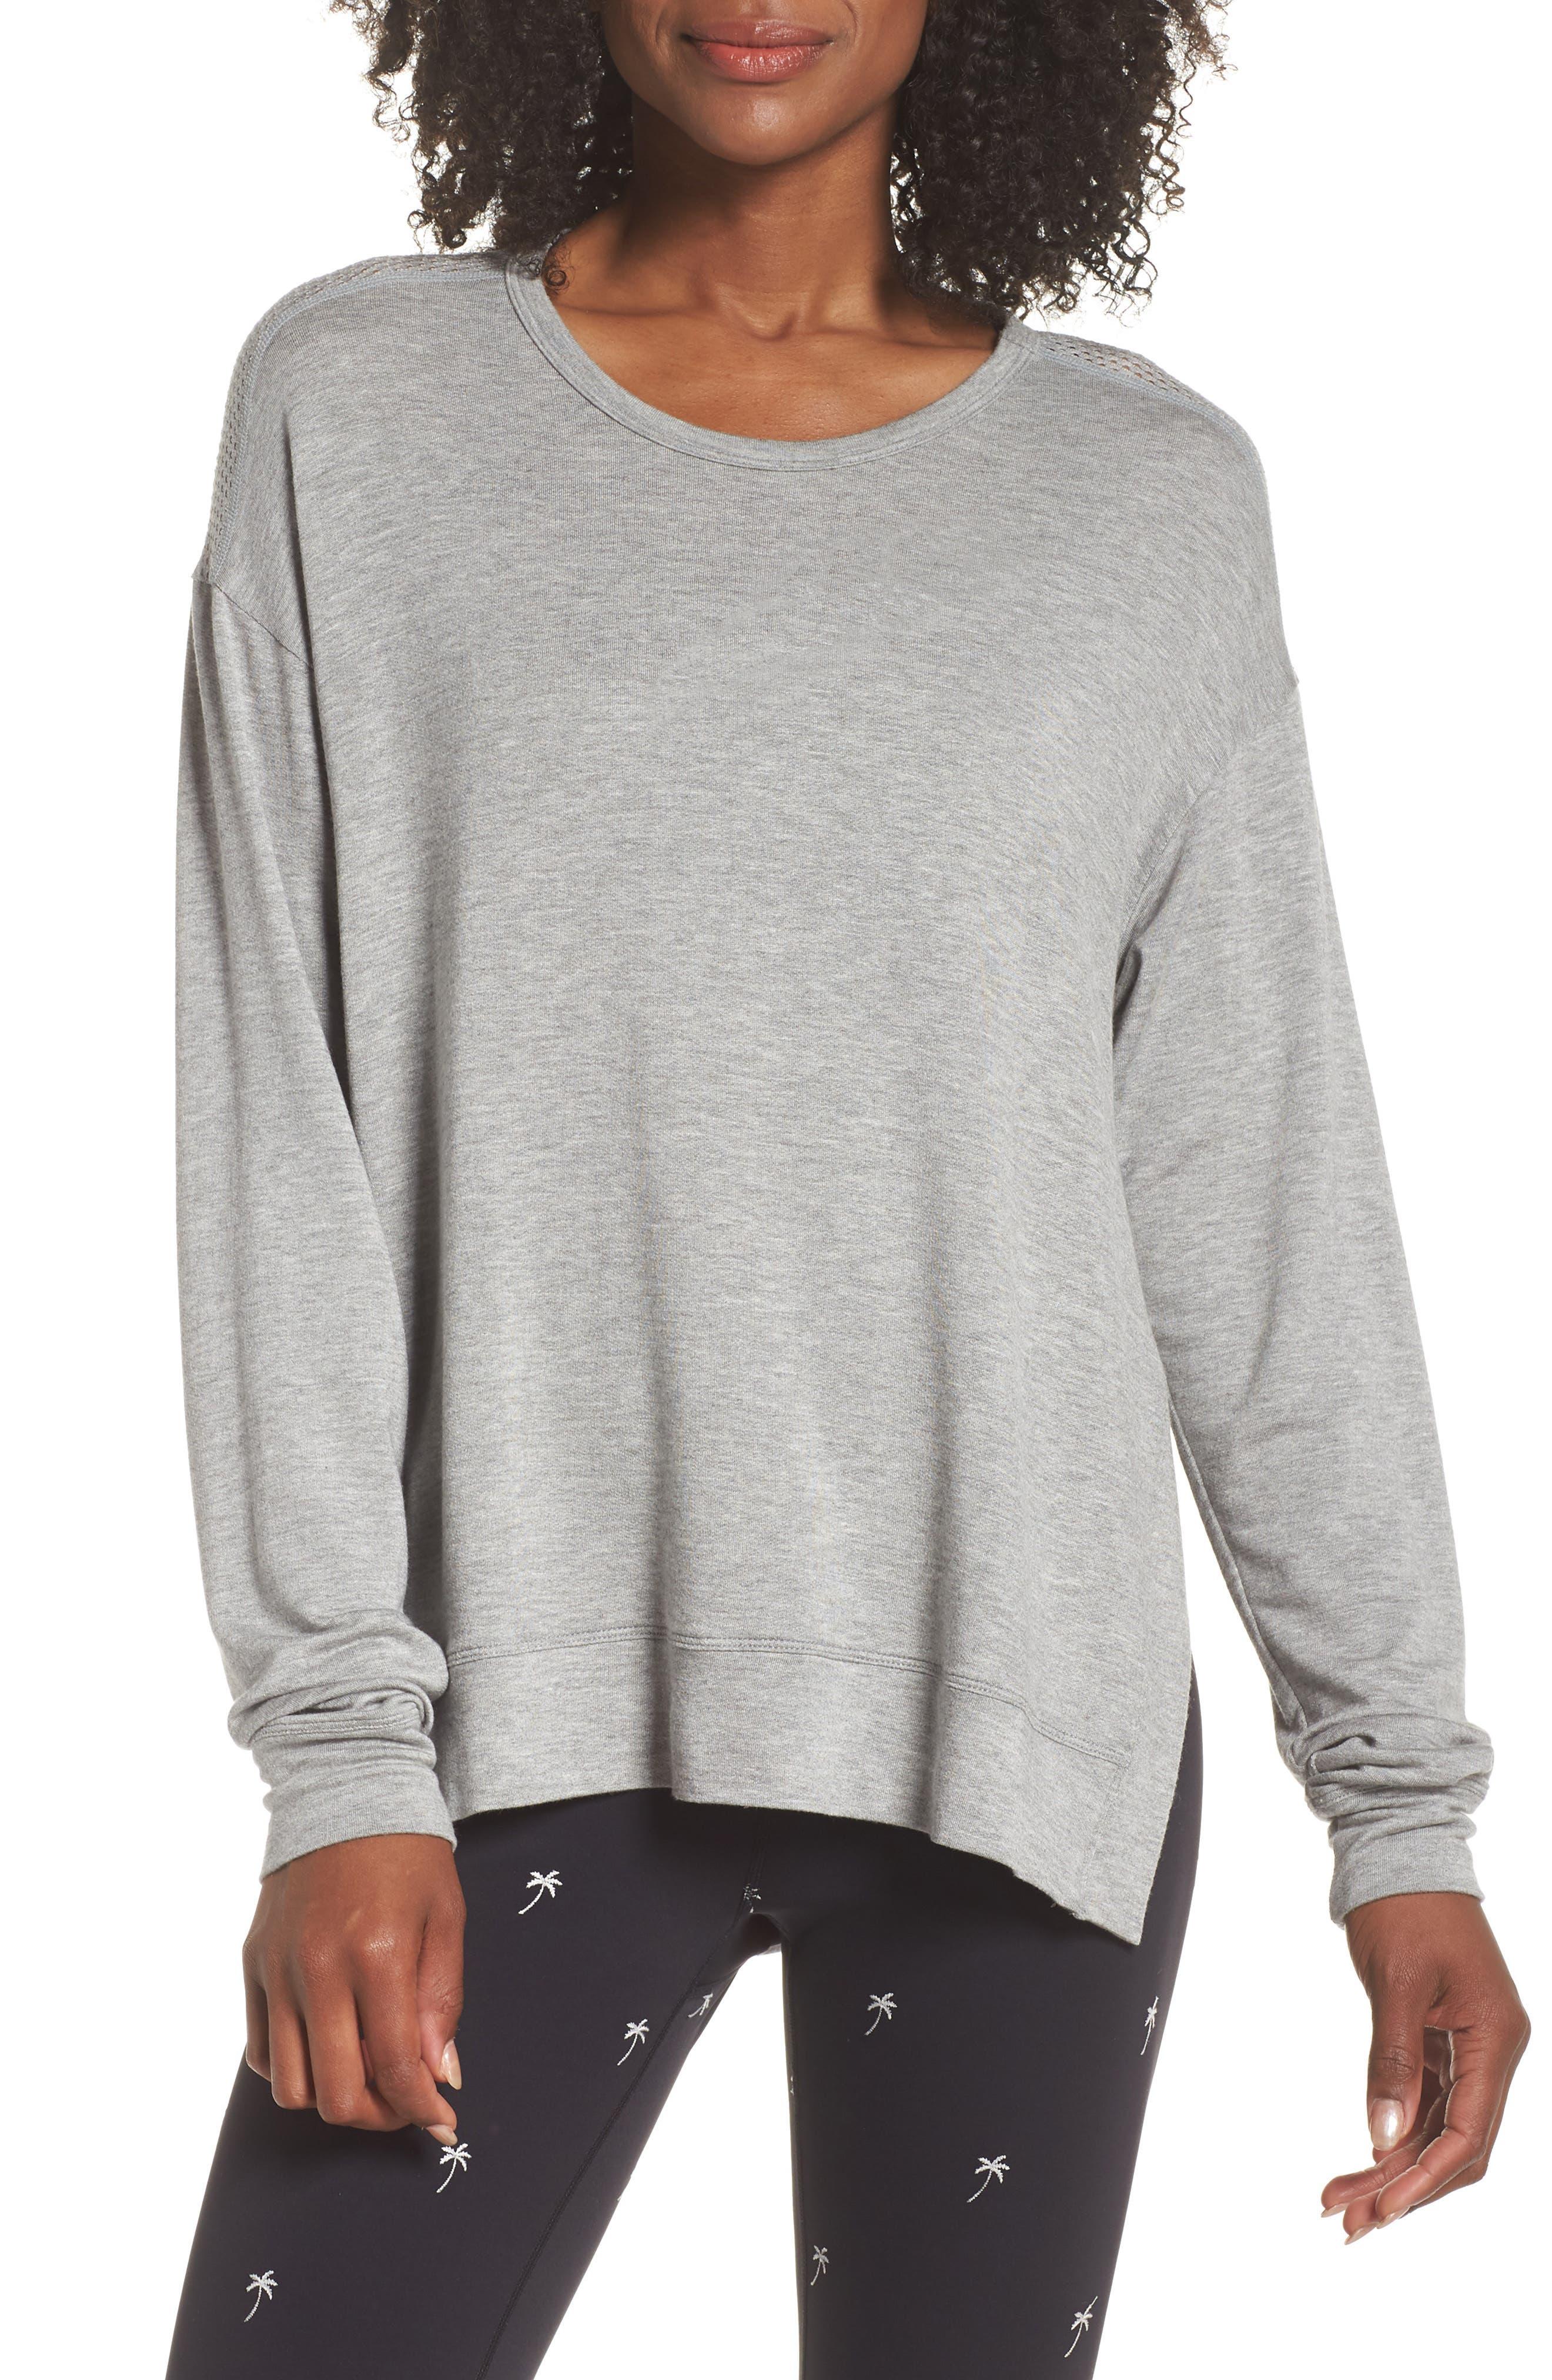 Heron Mesh Back Sweatshirt,                         Main,                         color, HEATHER GREY